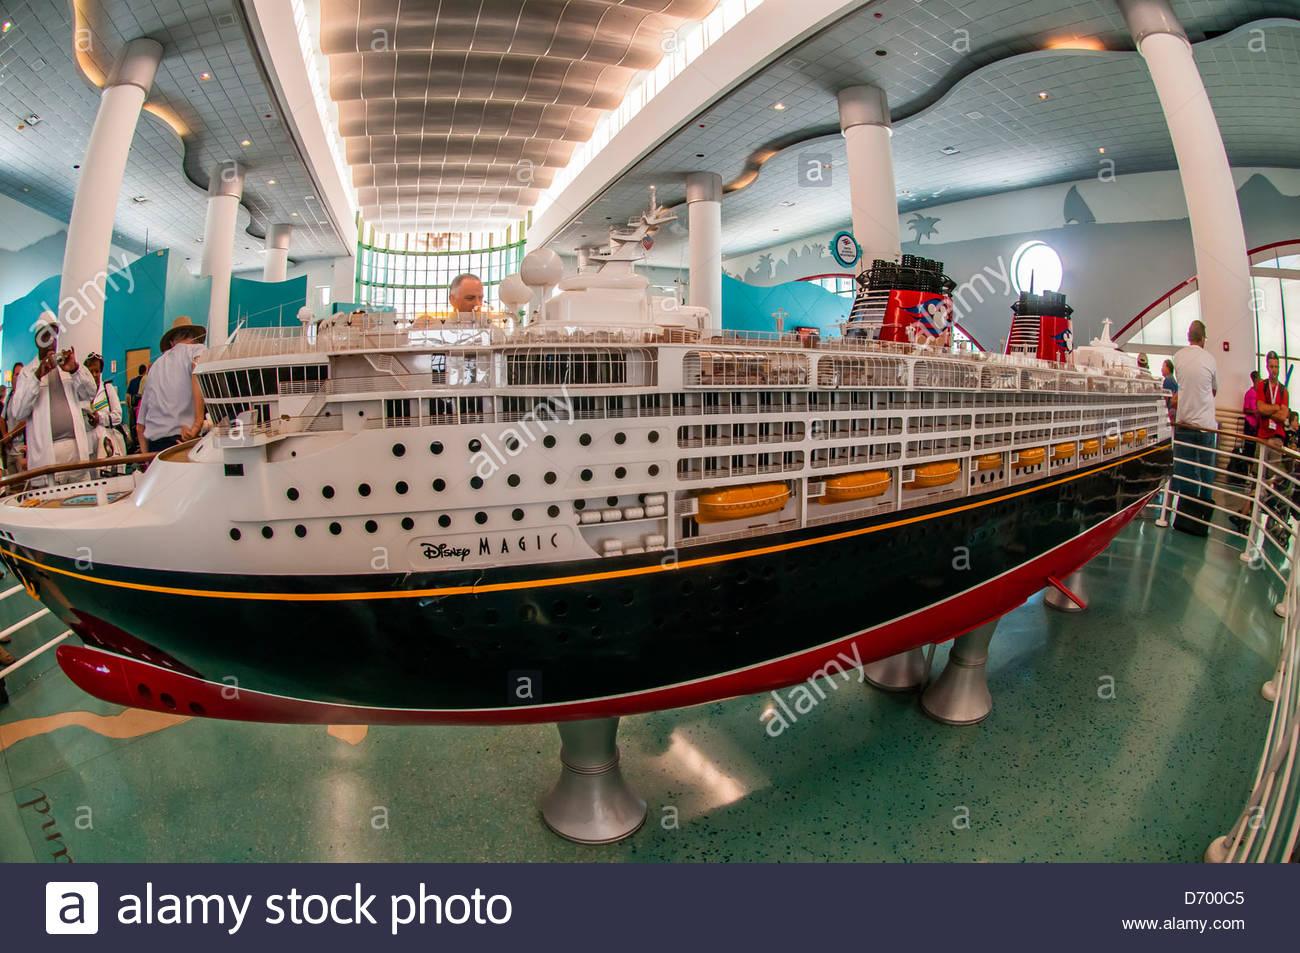 Model Of The New Disney Dream Cruise Ship Disney Cruise Line Stock